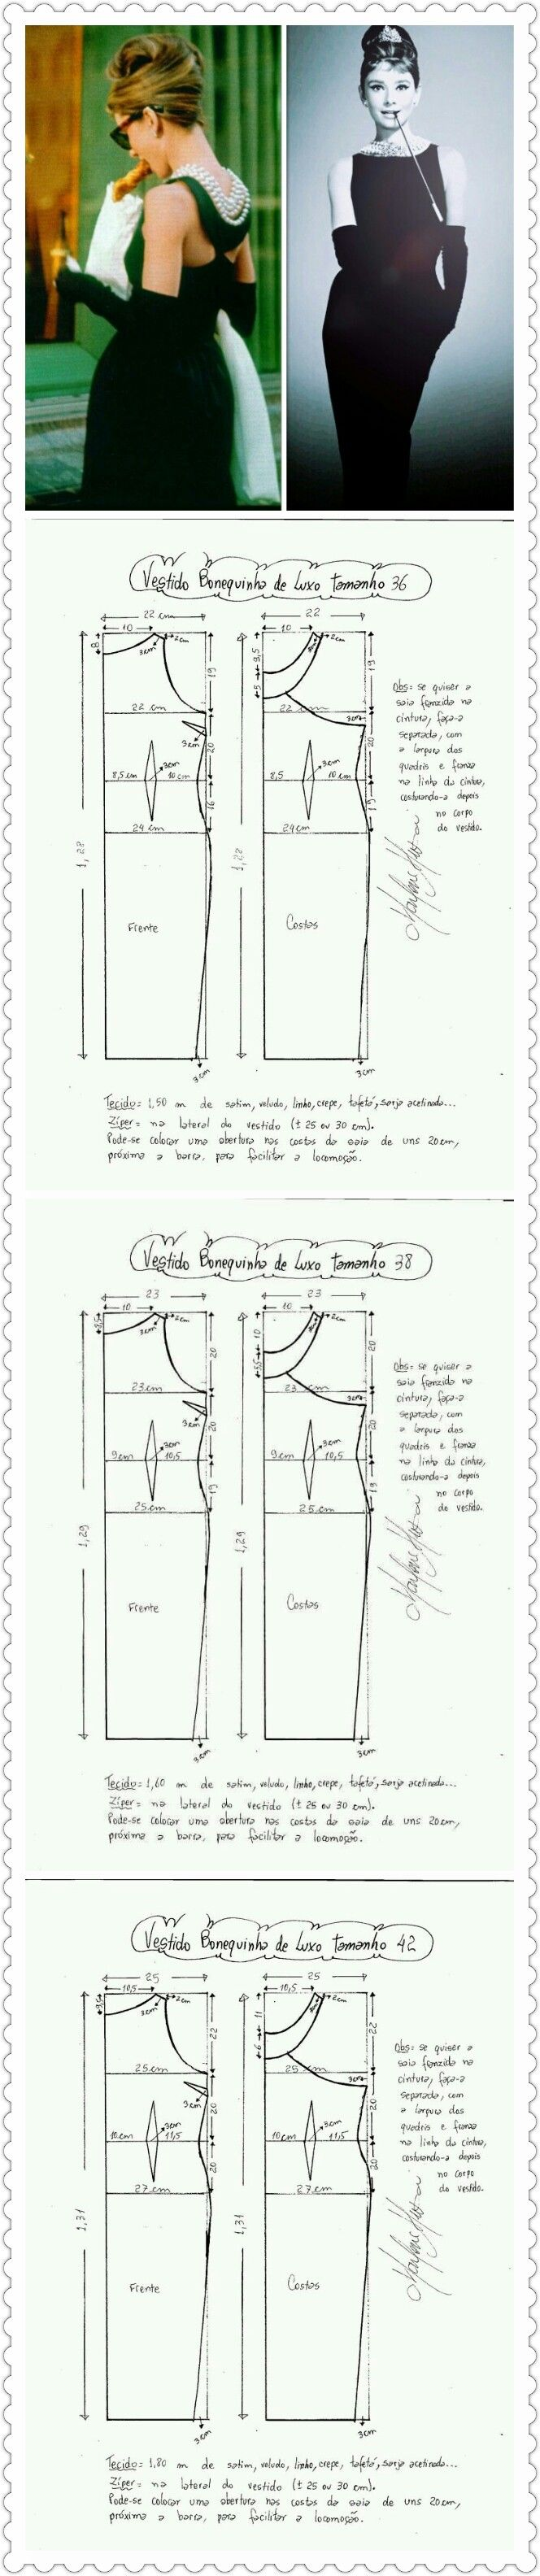 Pin von Sooyeon Cho auf sewing | Pinterest | Nähen, Schnittmuster ...